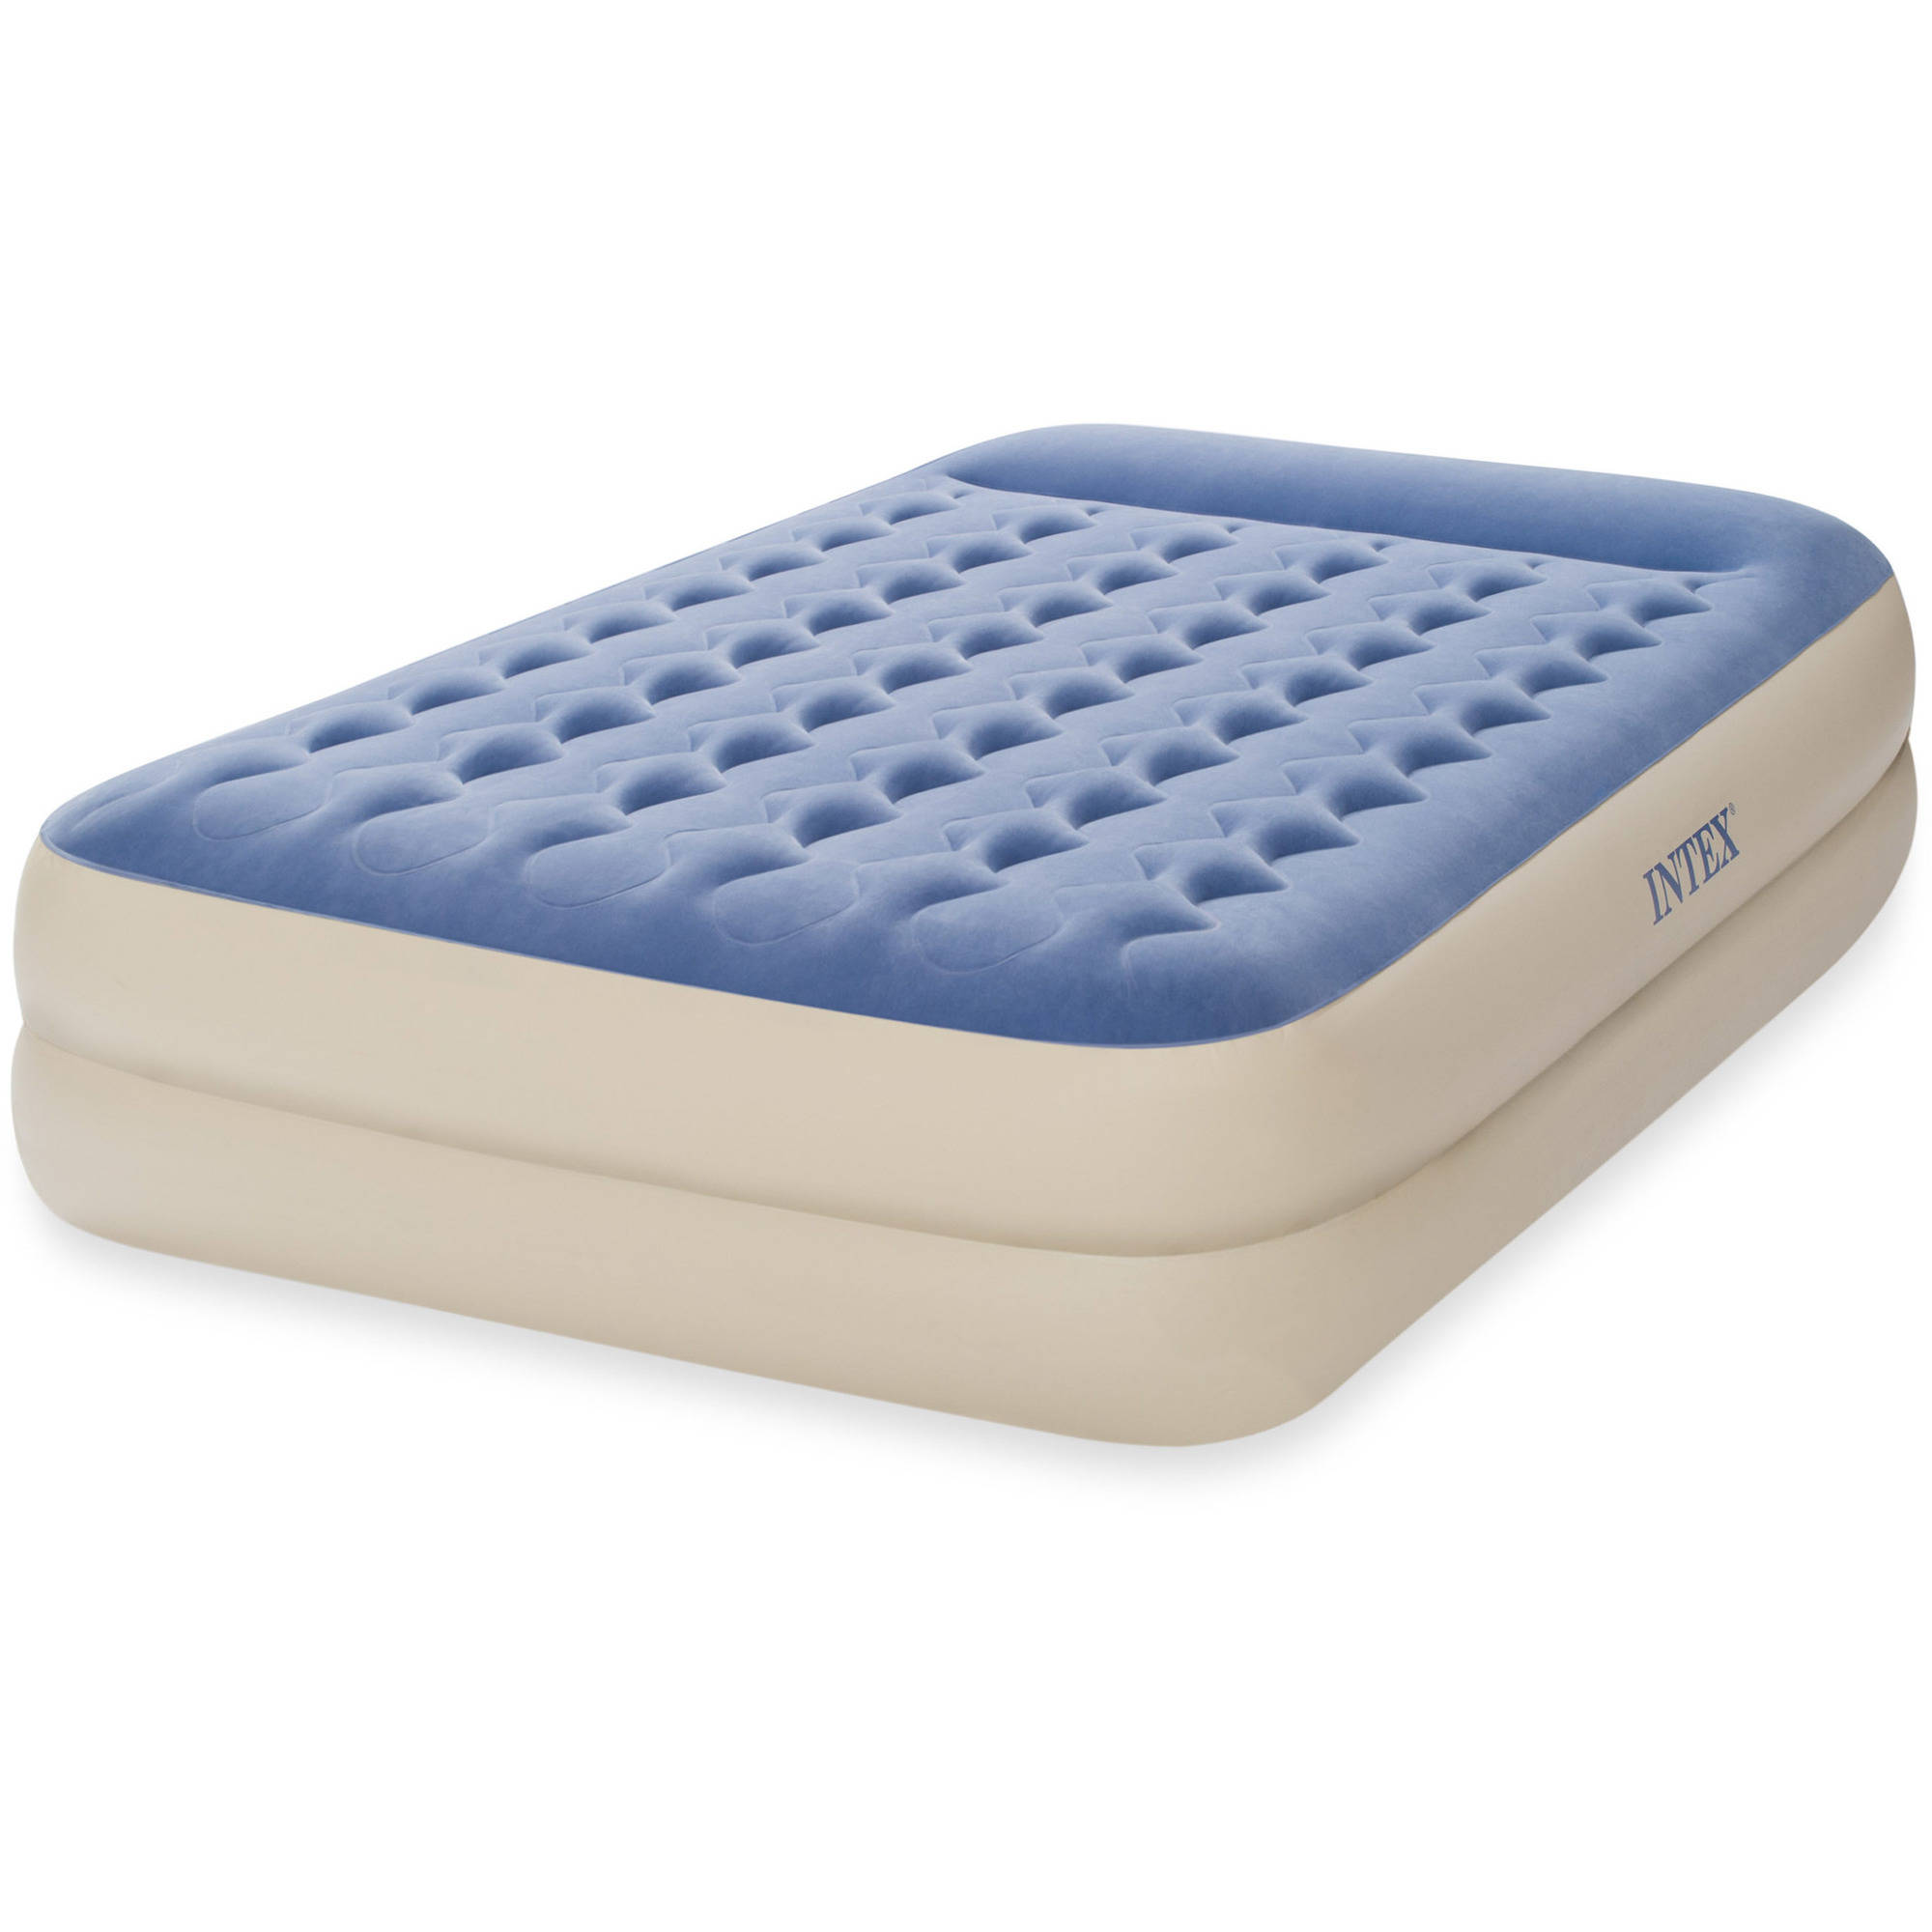 "Intex 18"" Dura-beam Standard Raised Pillow Rest Air ..."